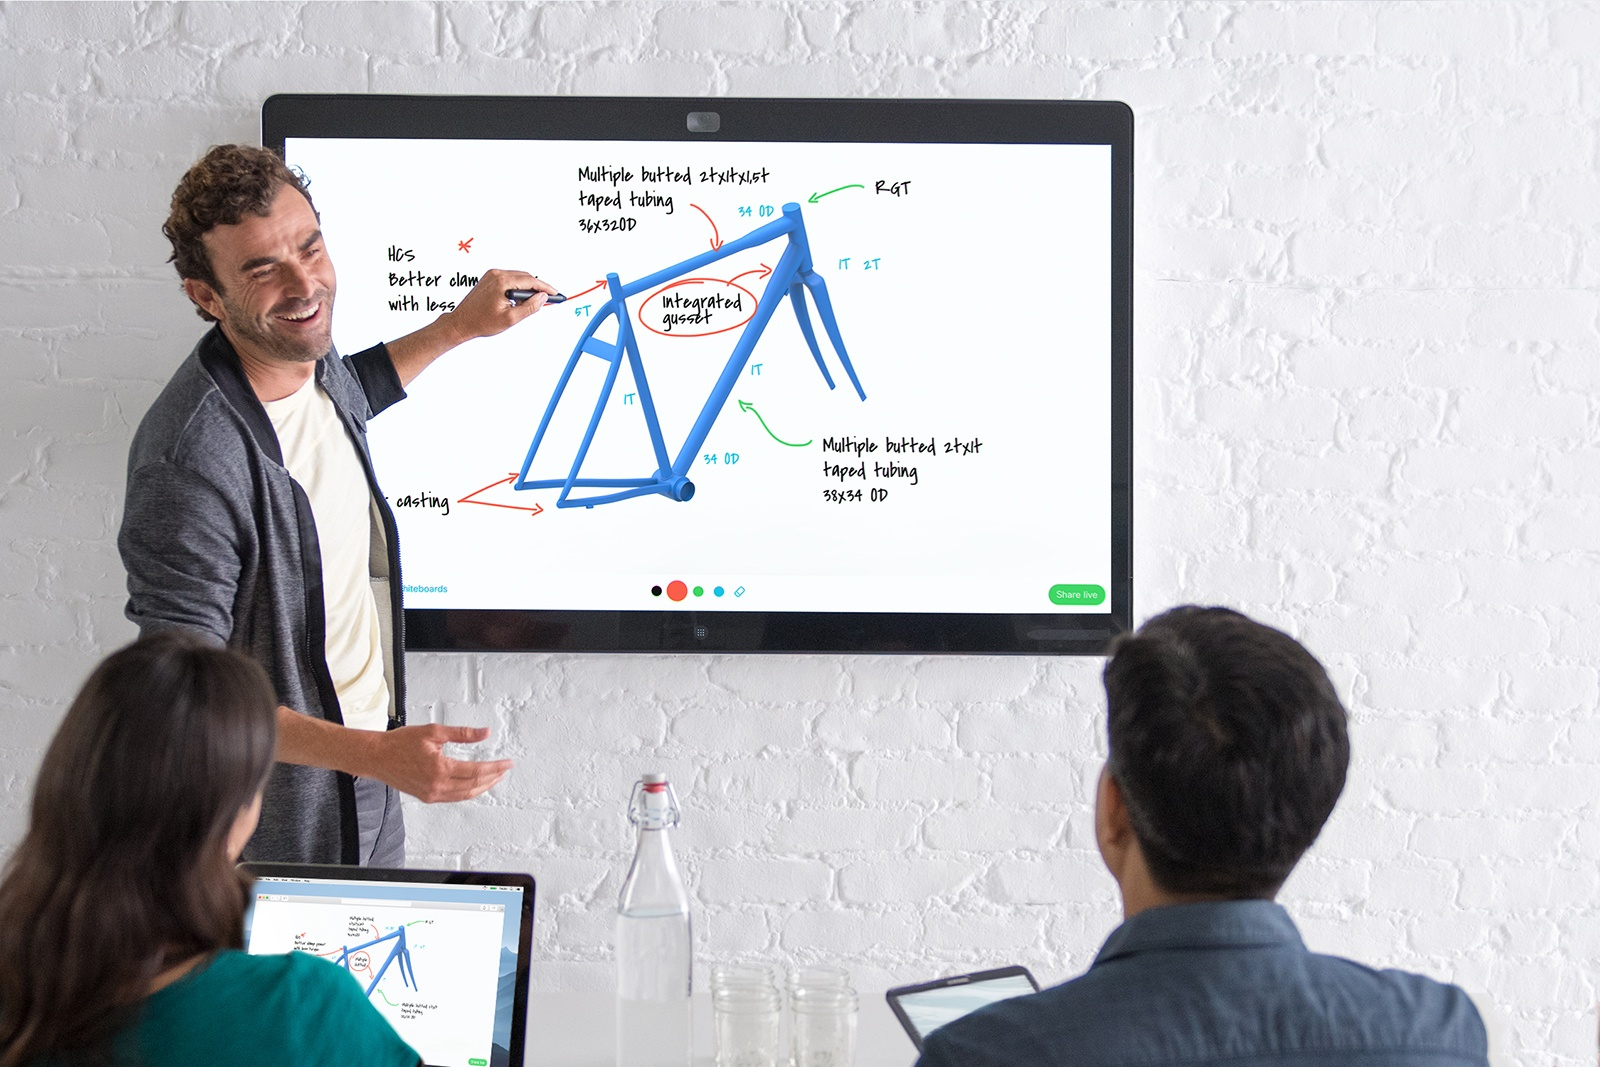 Cisco Spark Board Image 3.jpg